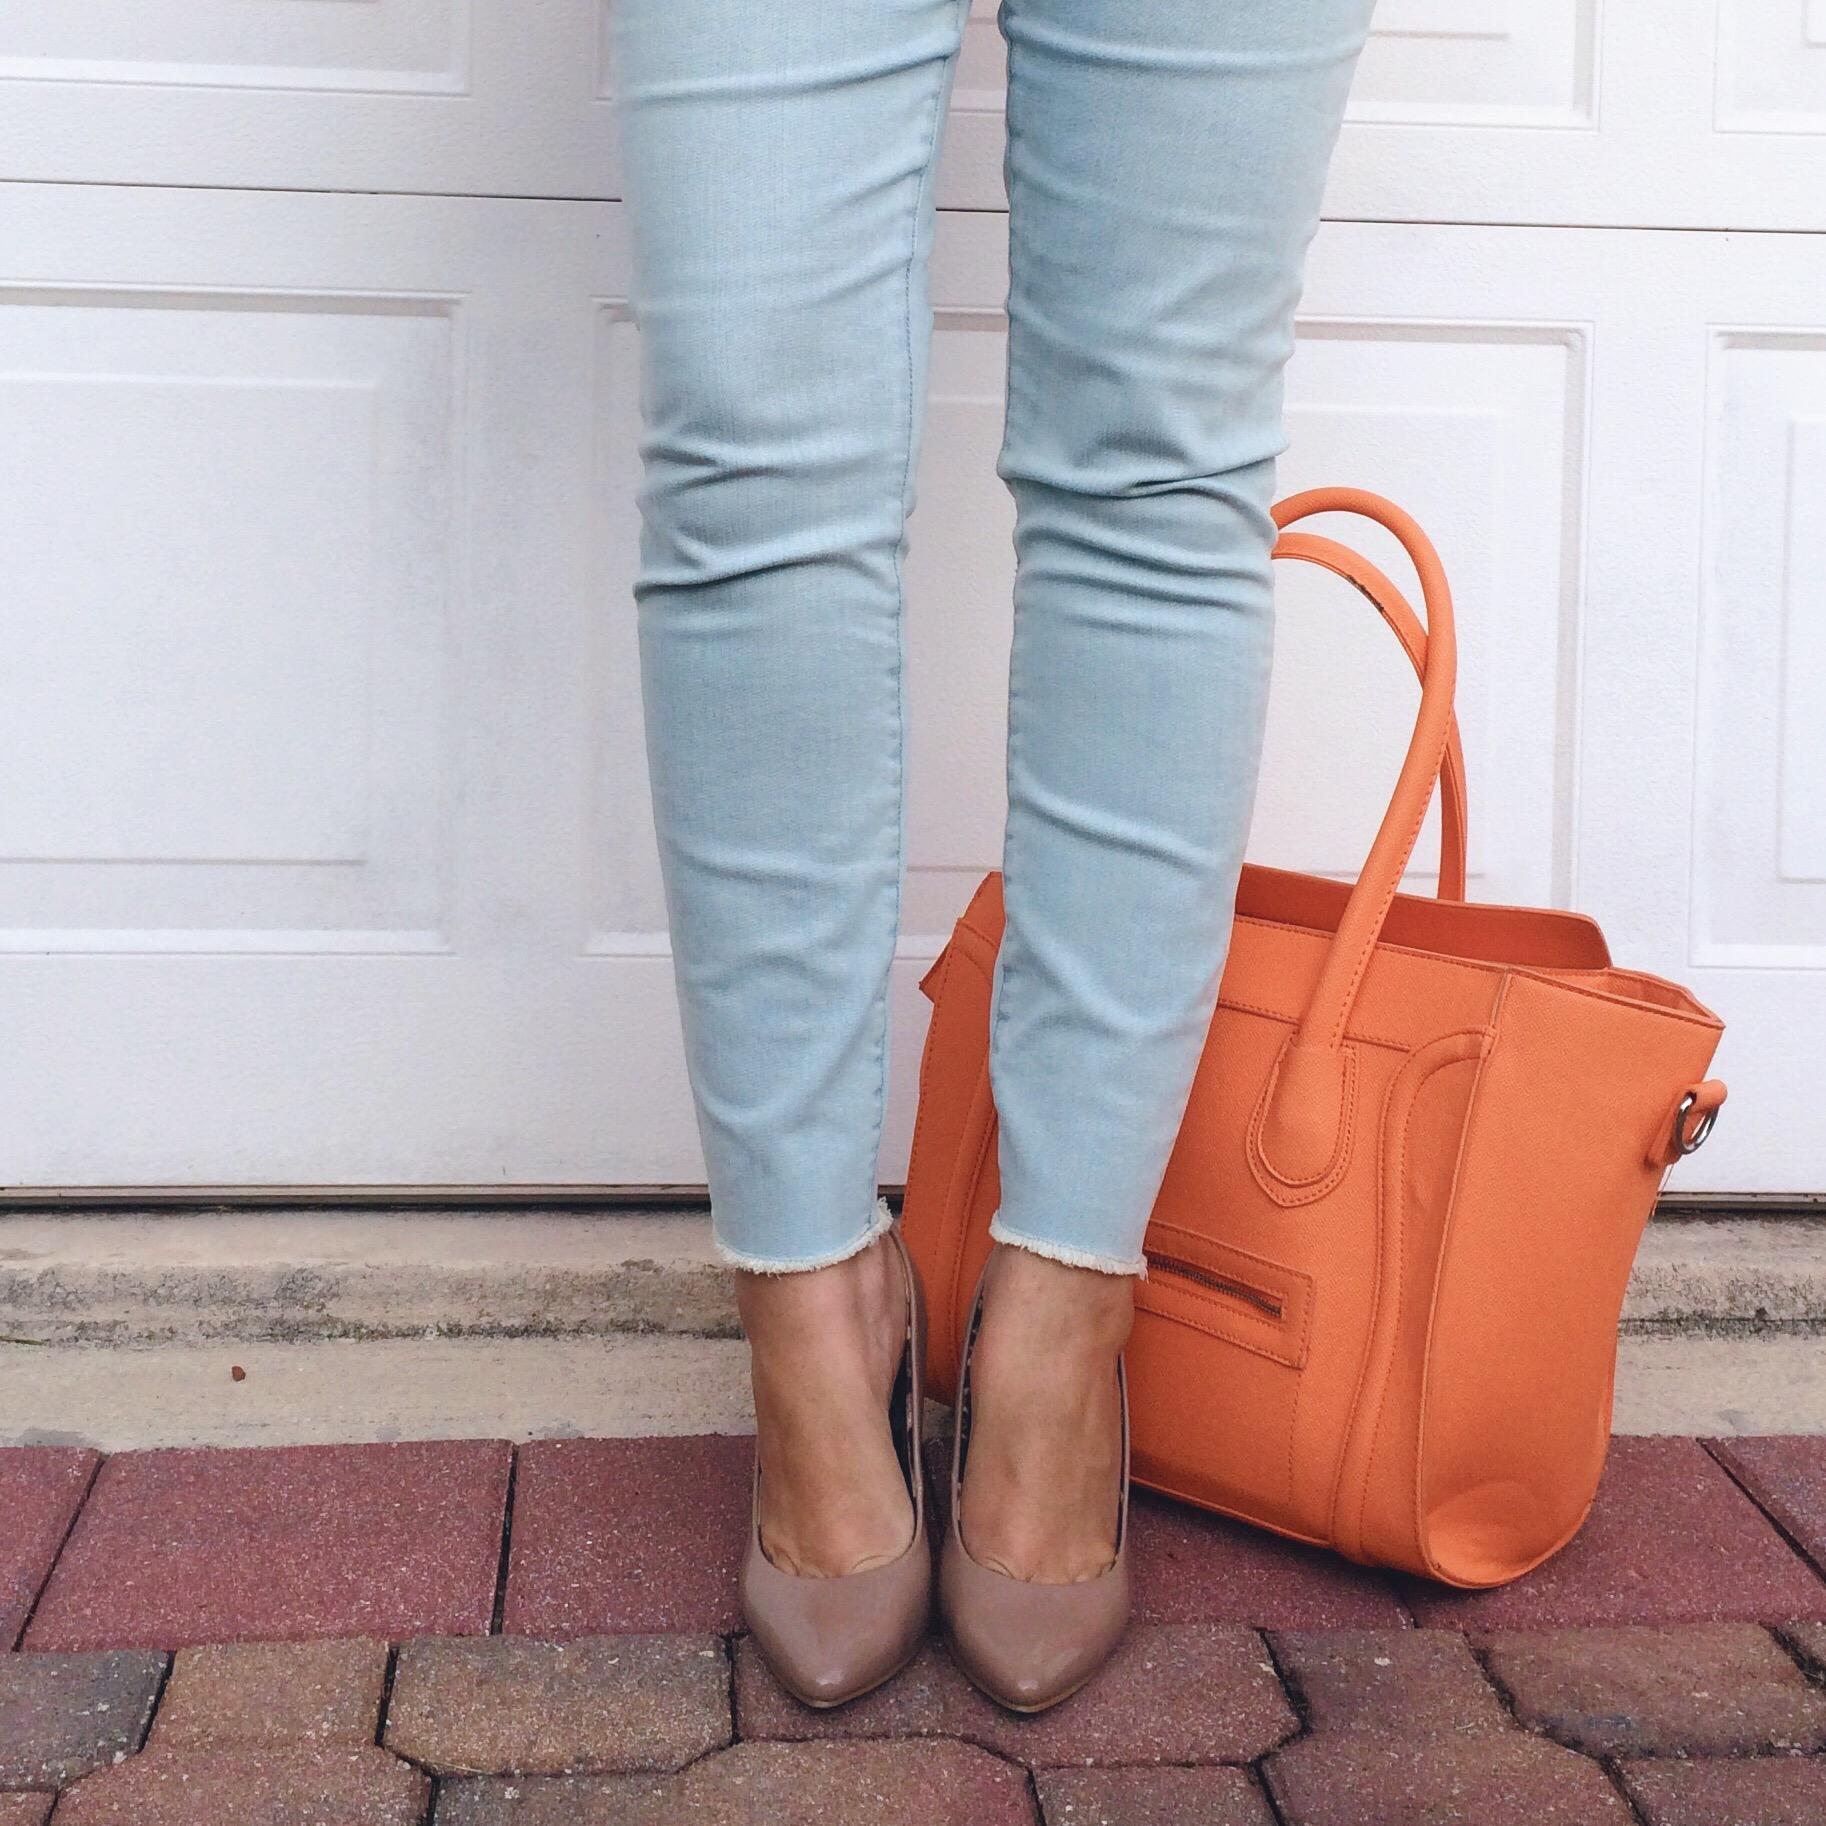 Loft Curvy High Waist Ankle Skinnies, Light Wash Jeans, Style Blogger, Summer Outfit Ideas